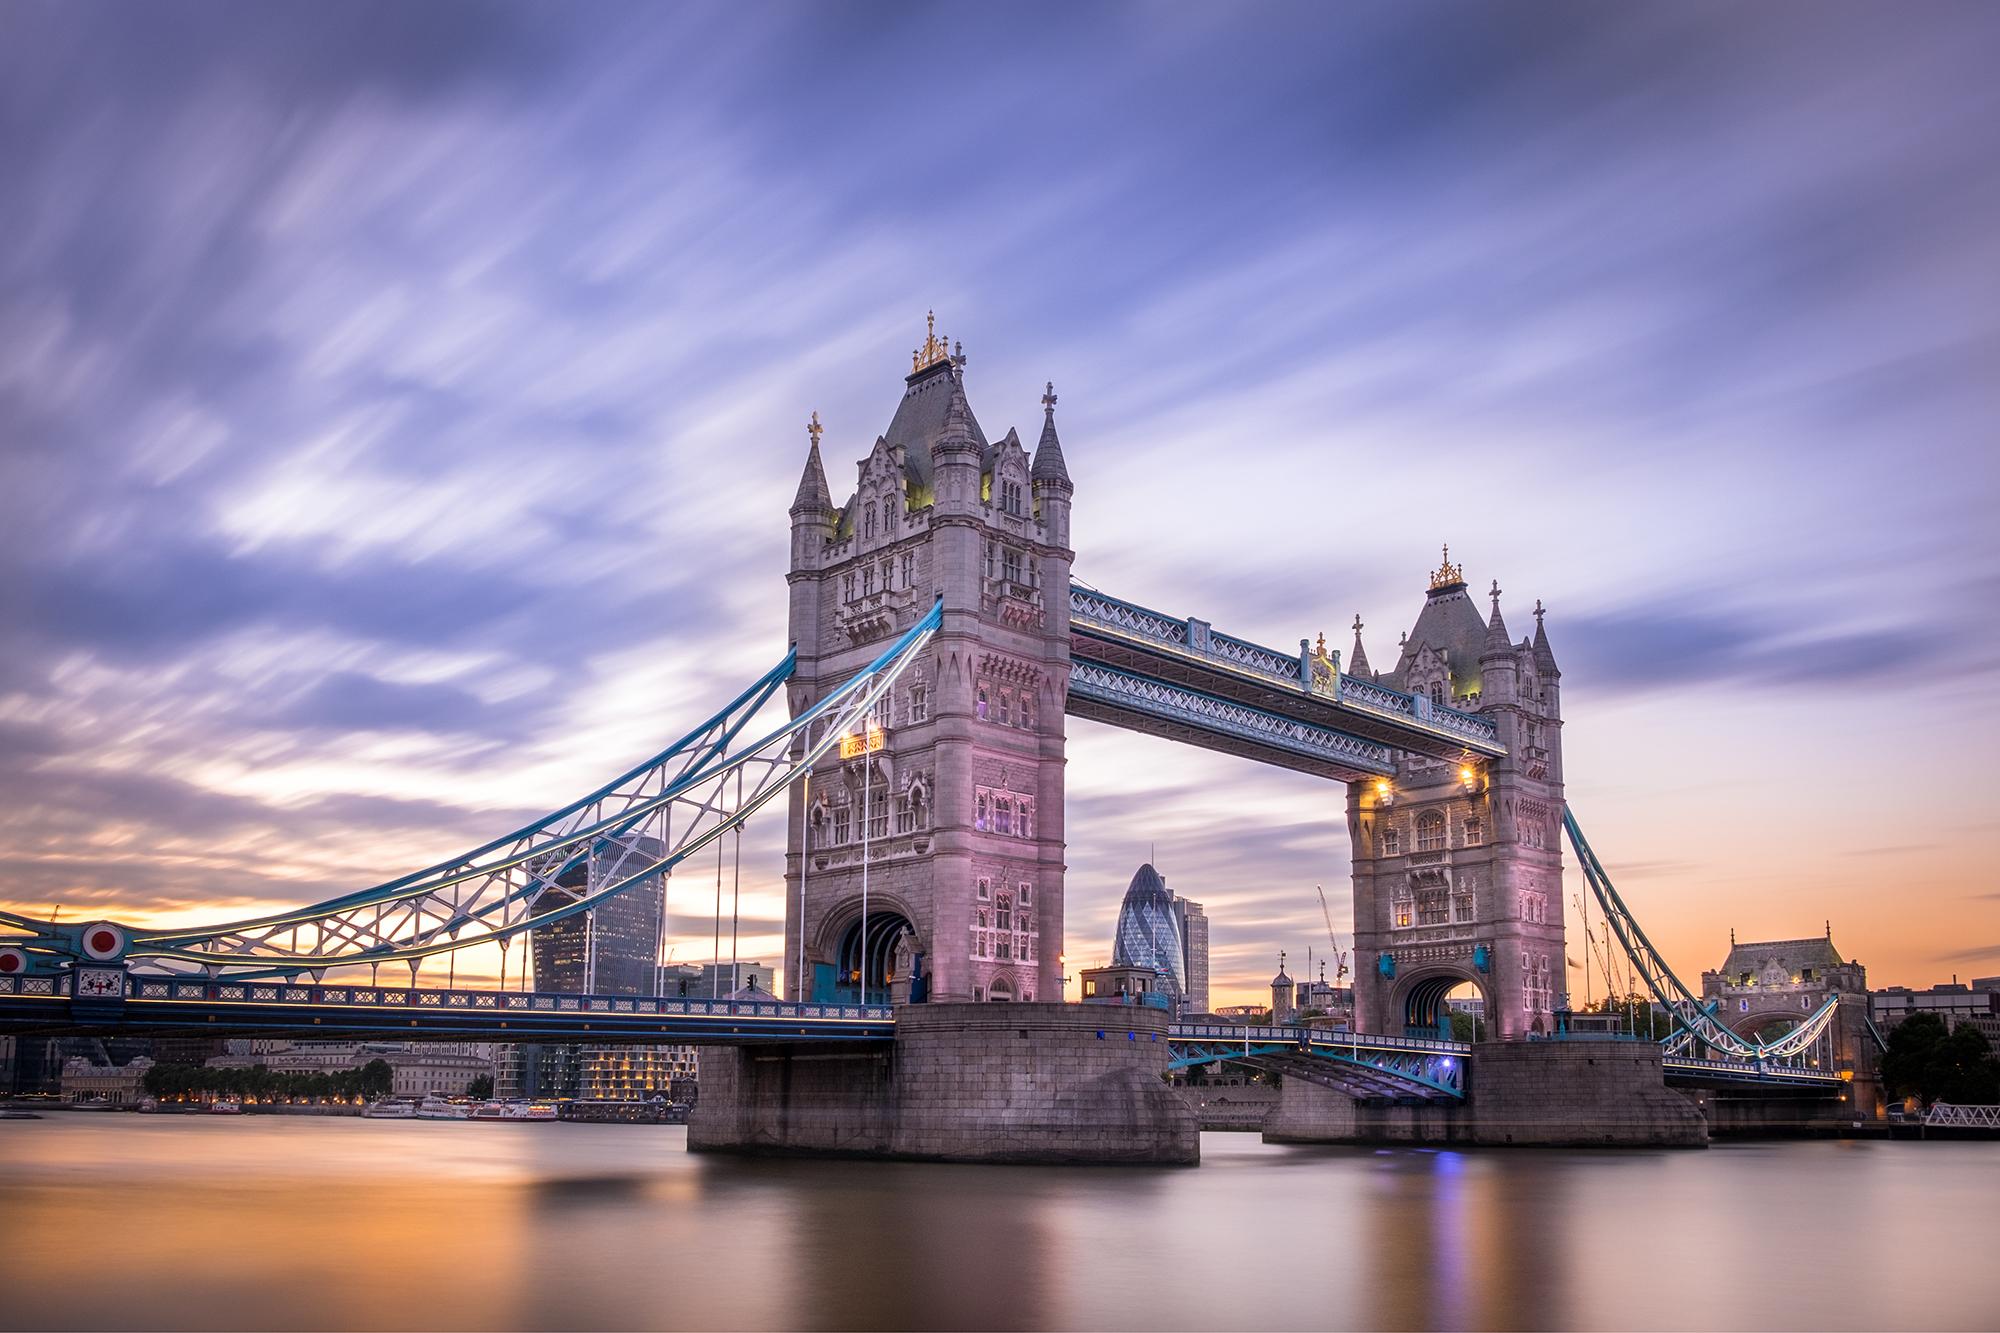 A long exposure photo of Tower Bridge at sunset taken by Trevor Sherwin